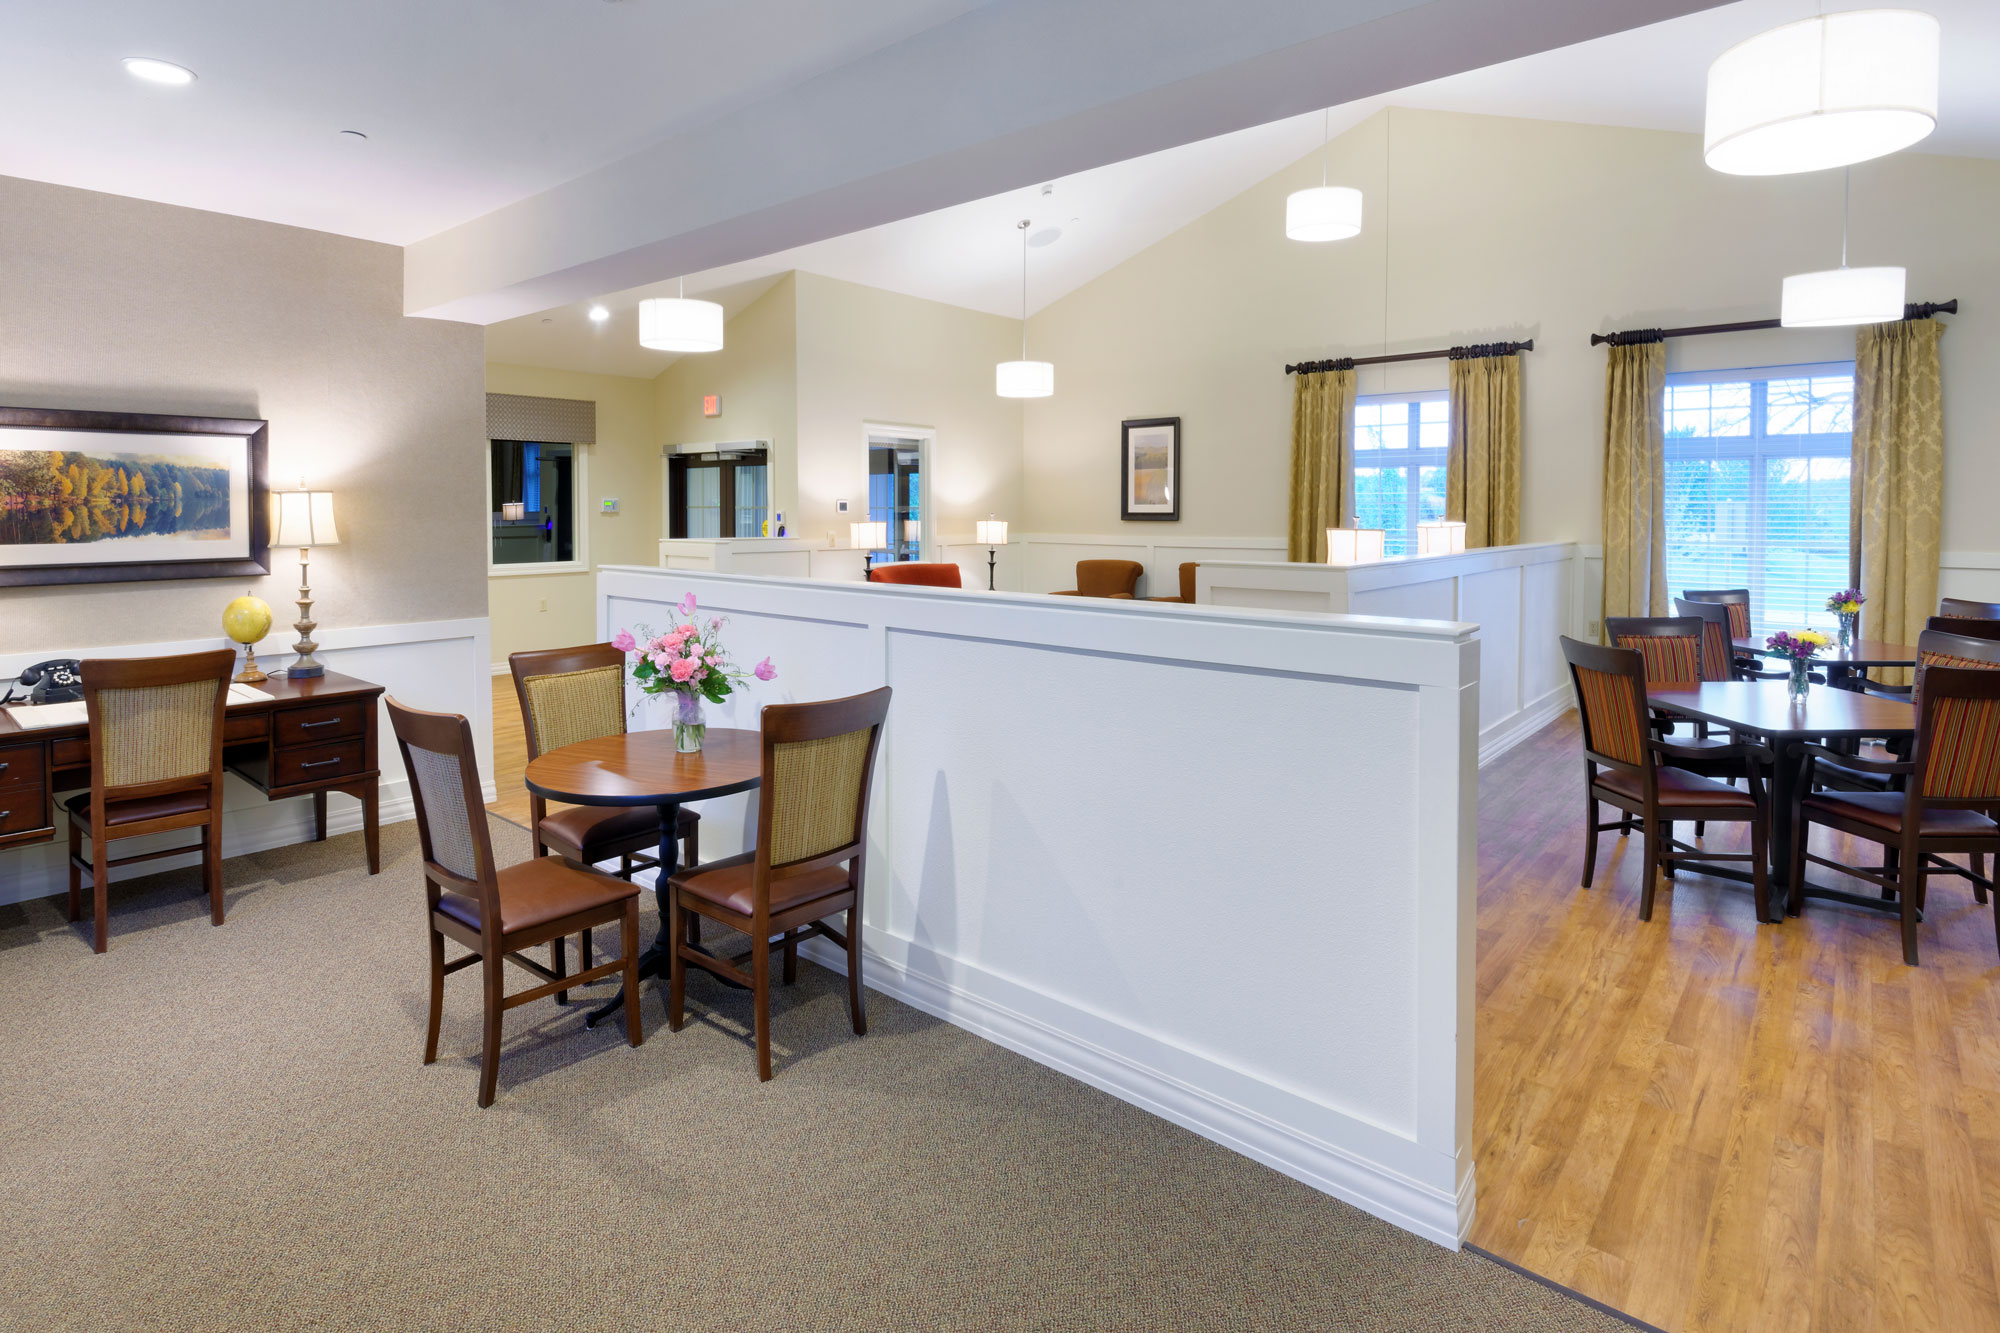 Castlewood-Senior-Living-H-Design-Interior-02.jpg